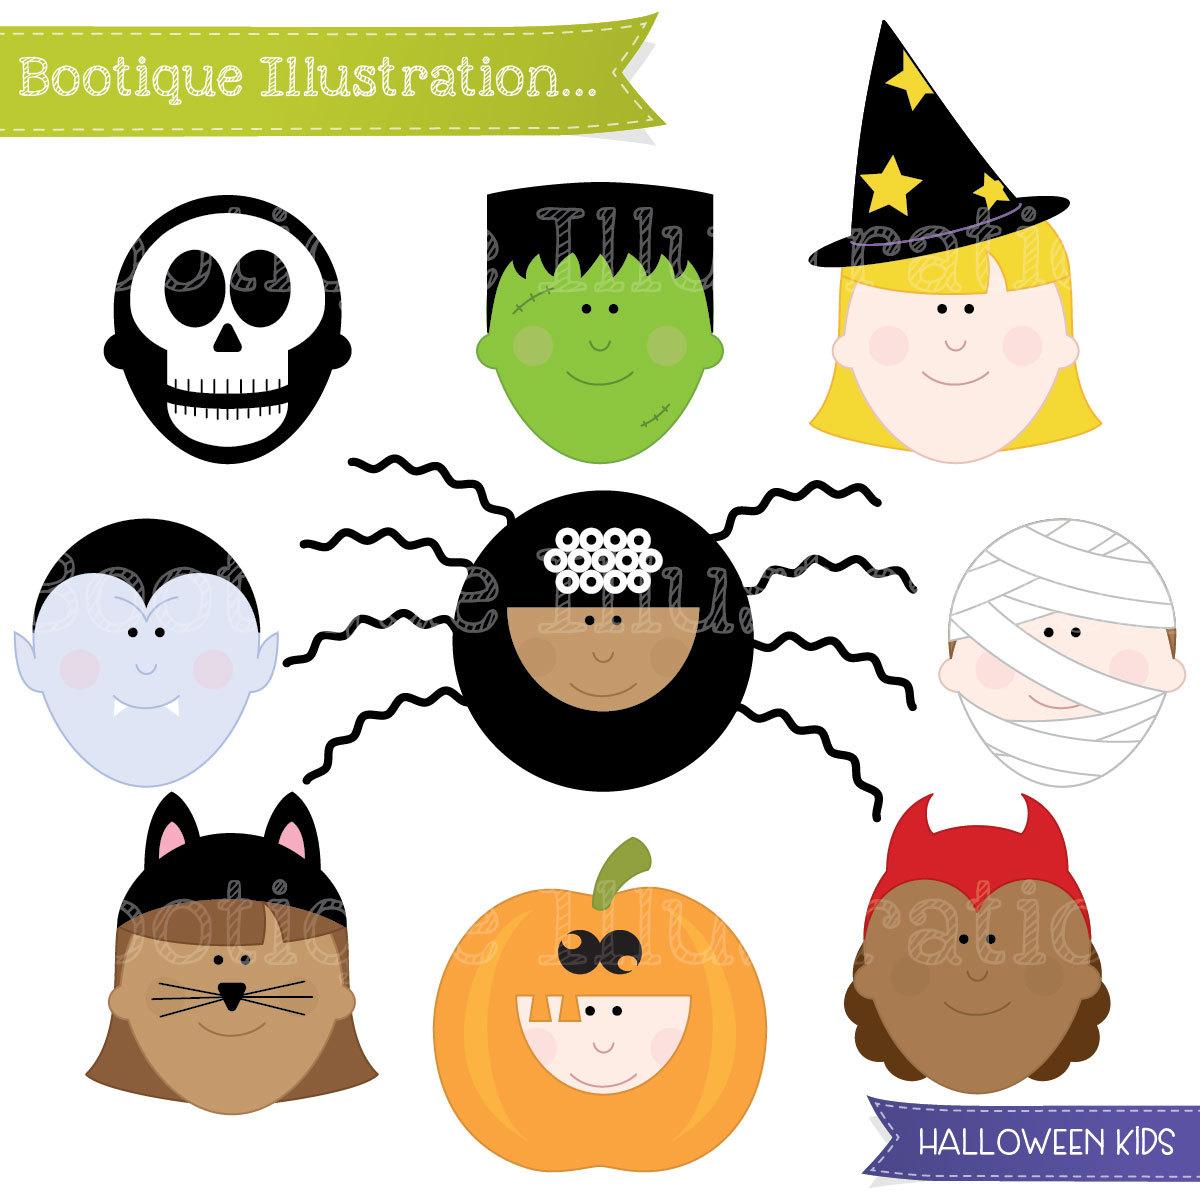 1200x1200 Boo Tique Illustration Clipart A Catalogue